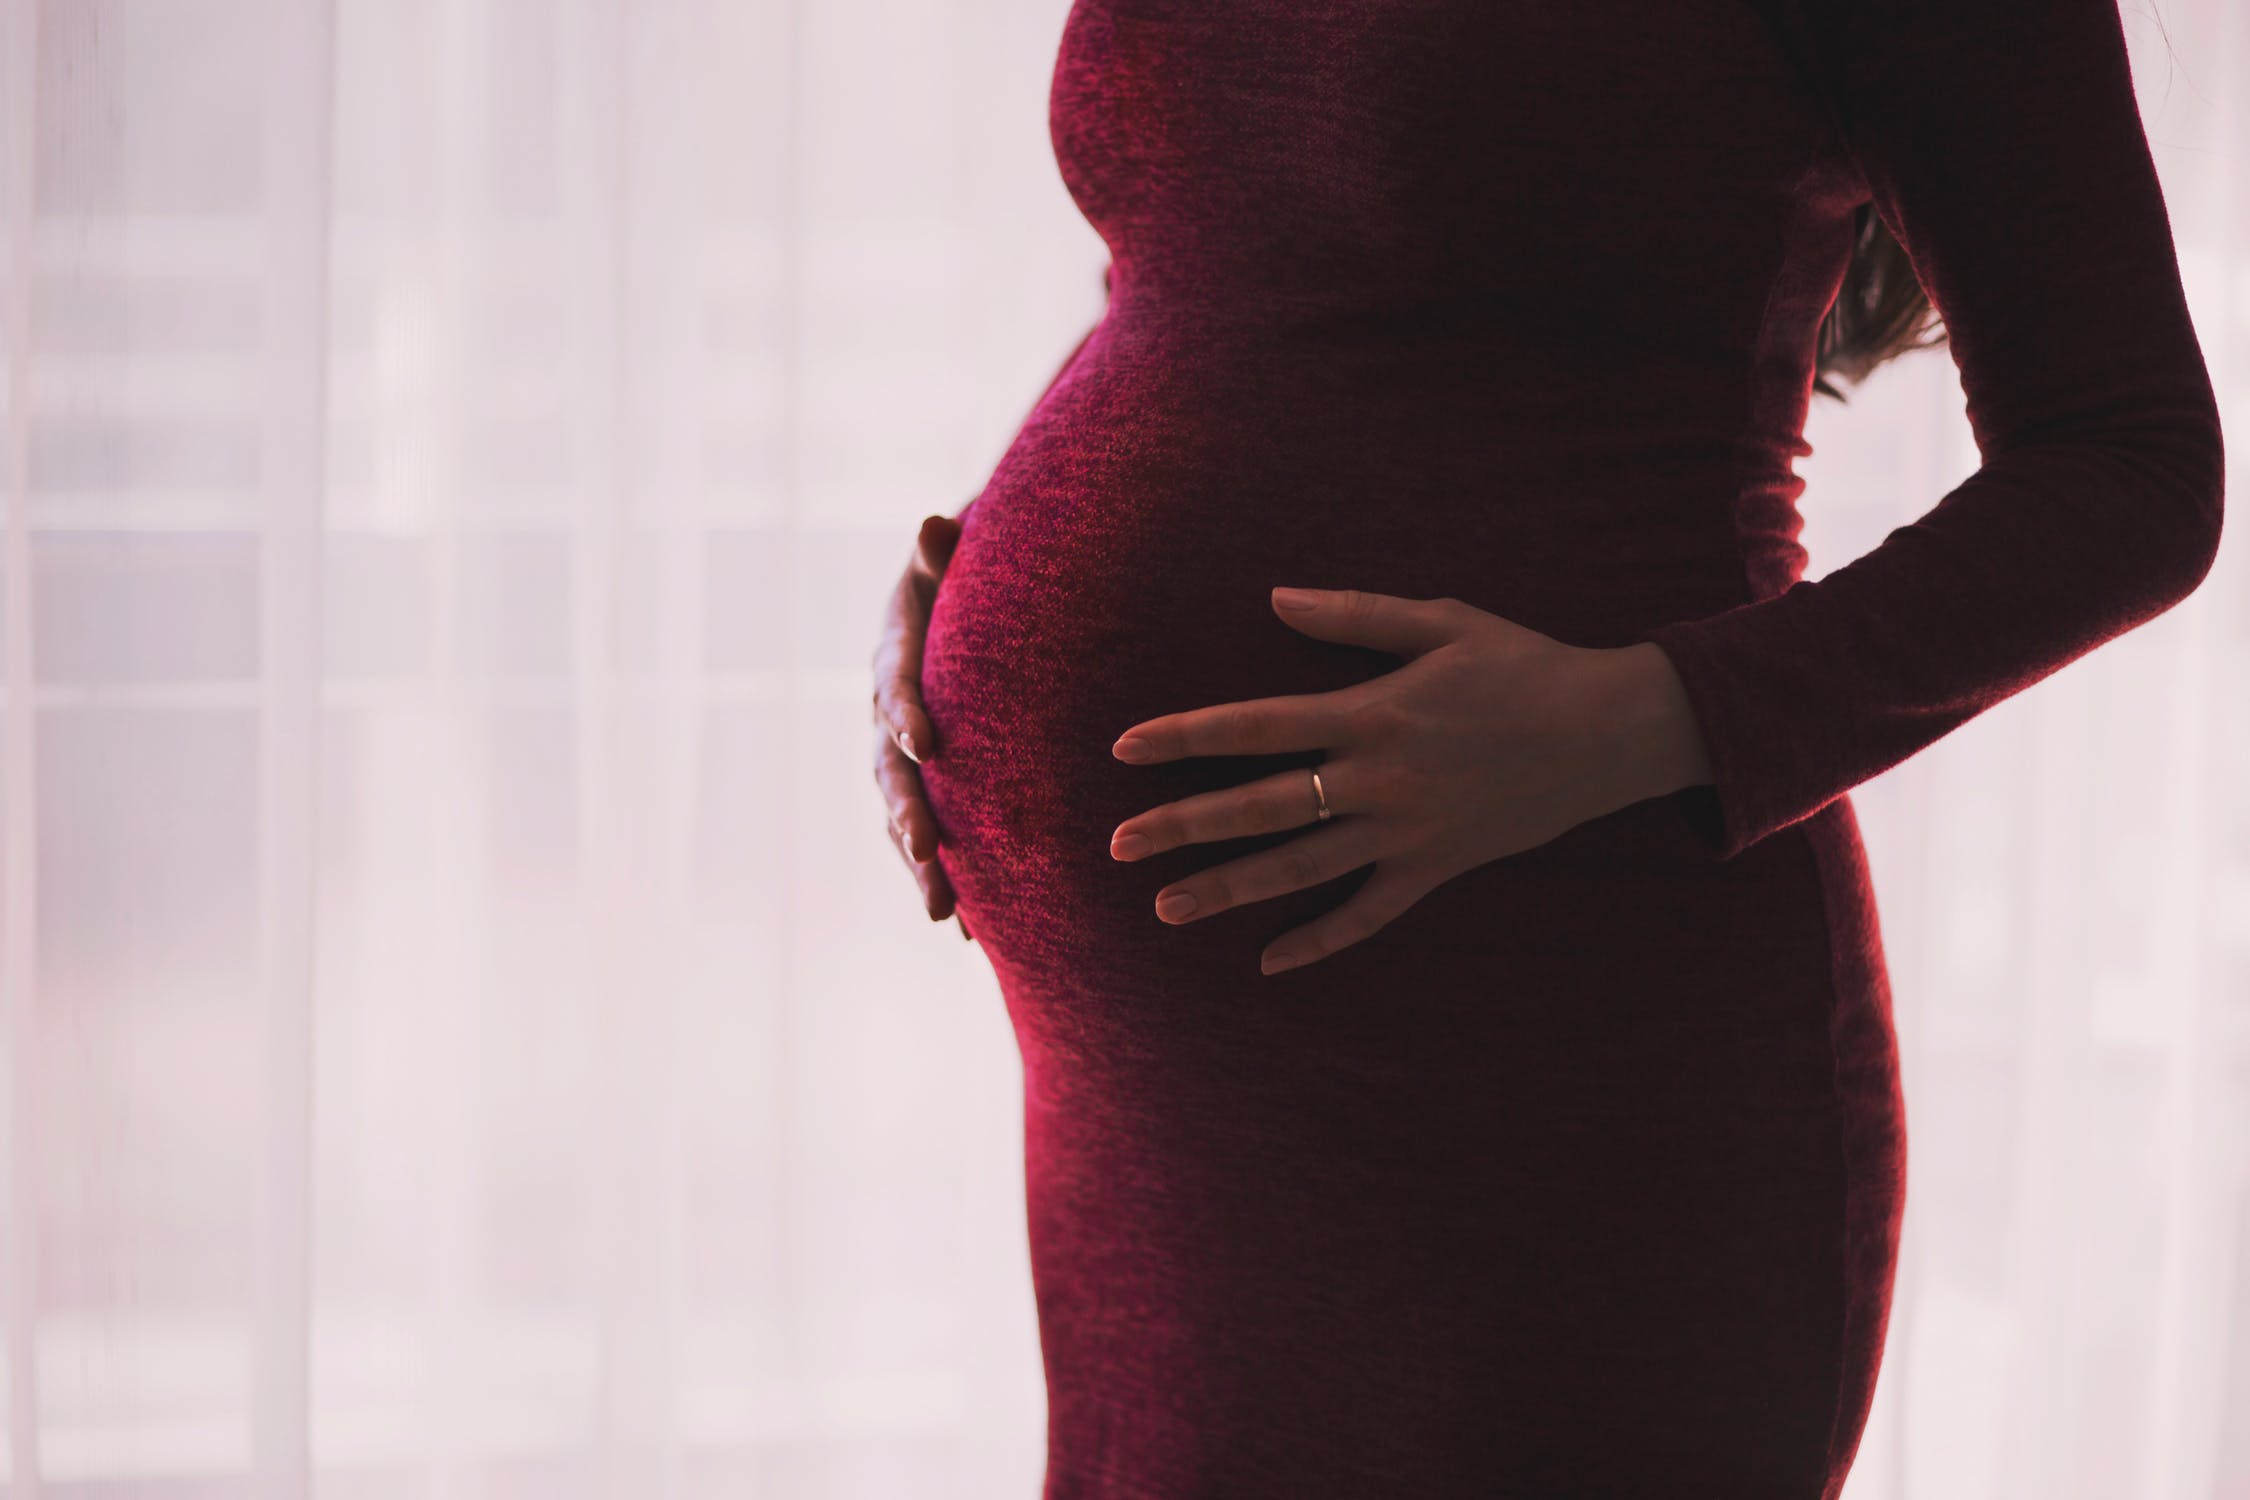 Mitos sobre la barriga de embarazada ??